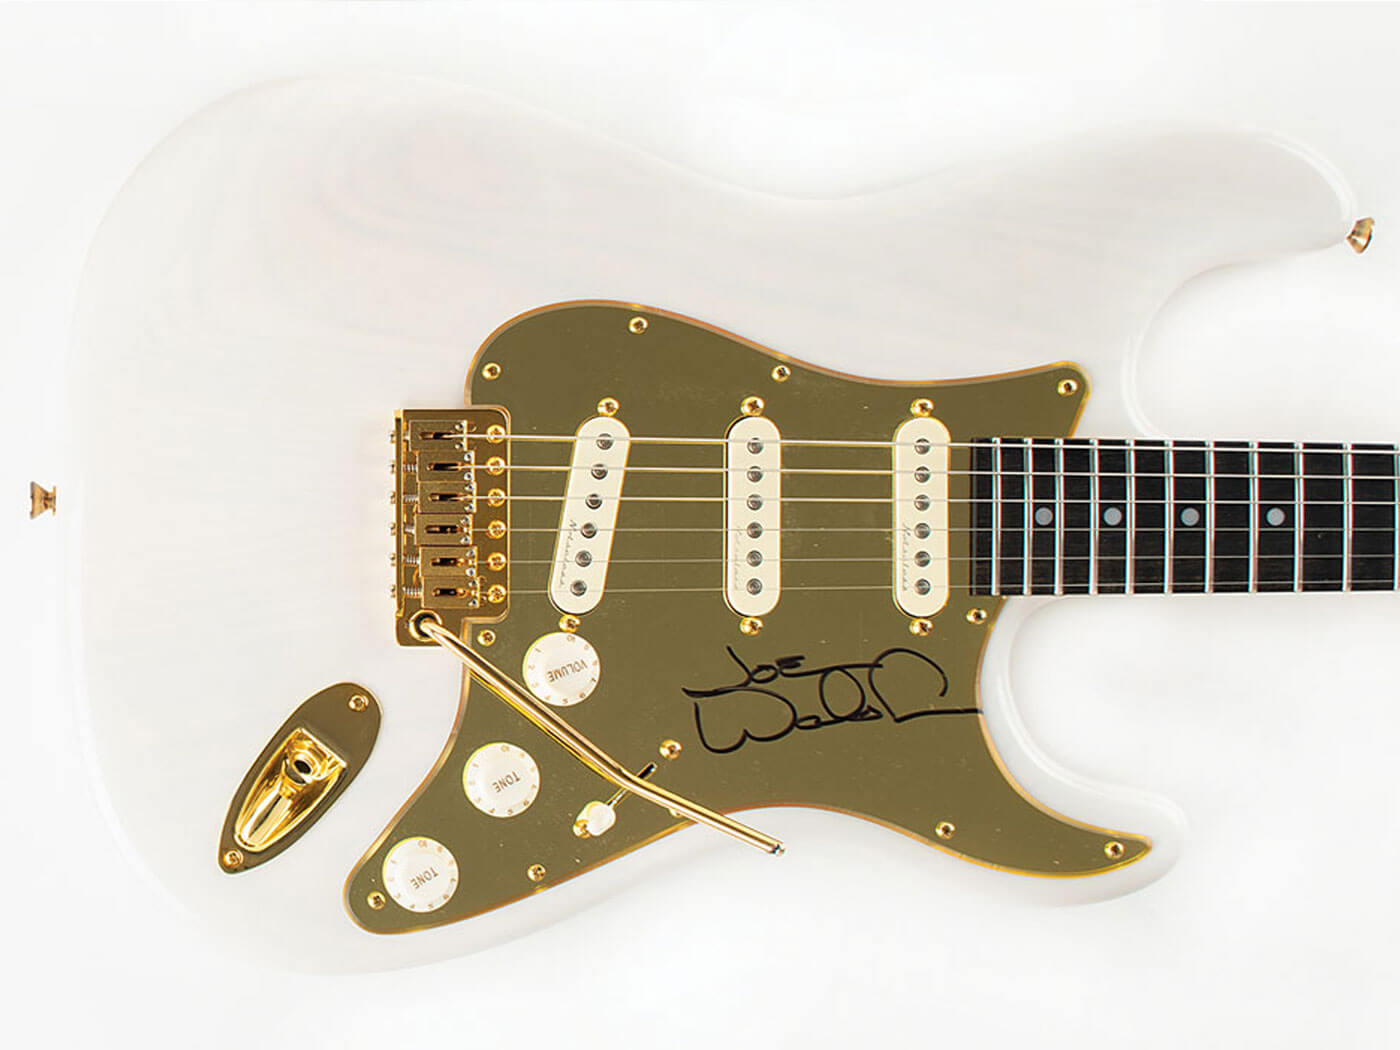 Joe Walsh's electric guitar